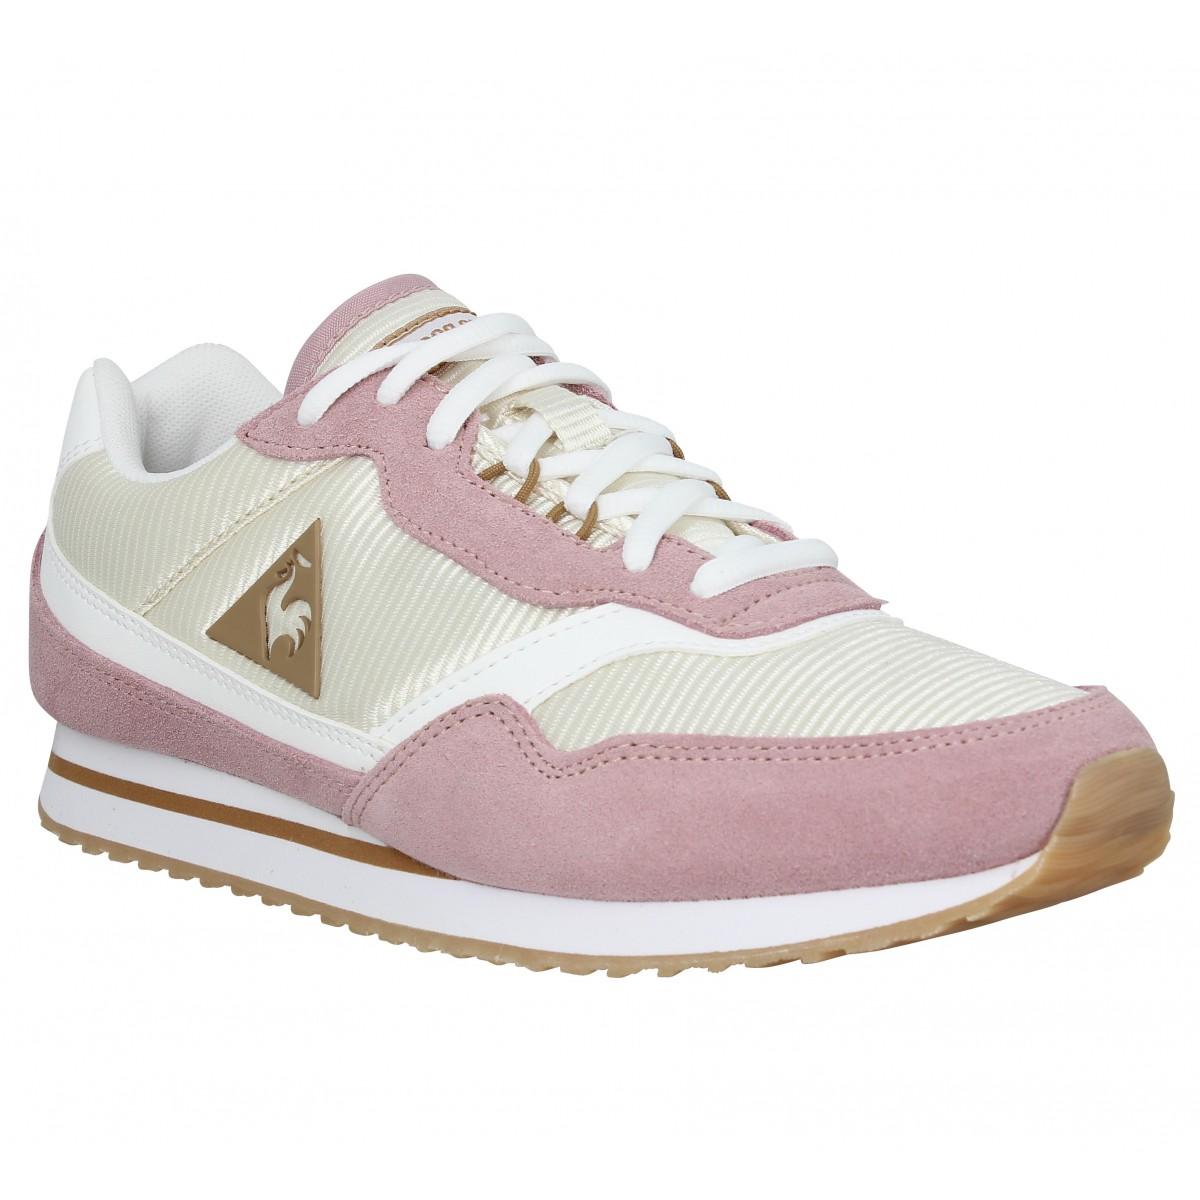 932cace235449 Marques Chaussure femme Reebok femme Club C 85 Tonal Nbk Sandstone ...